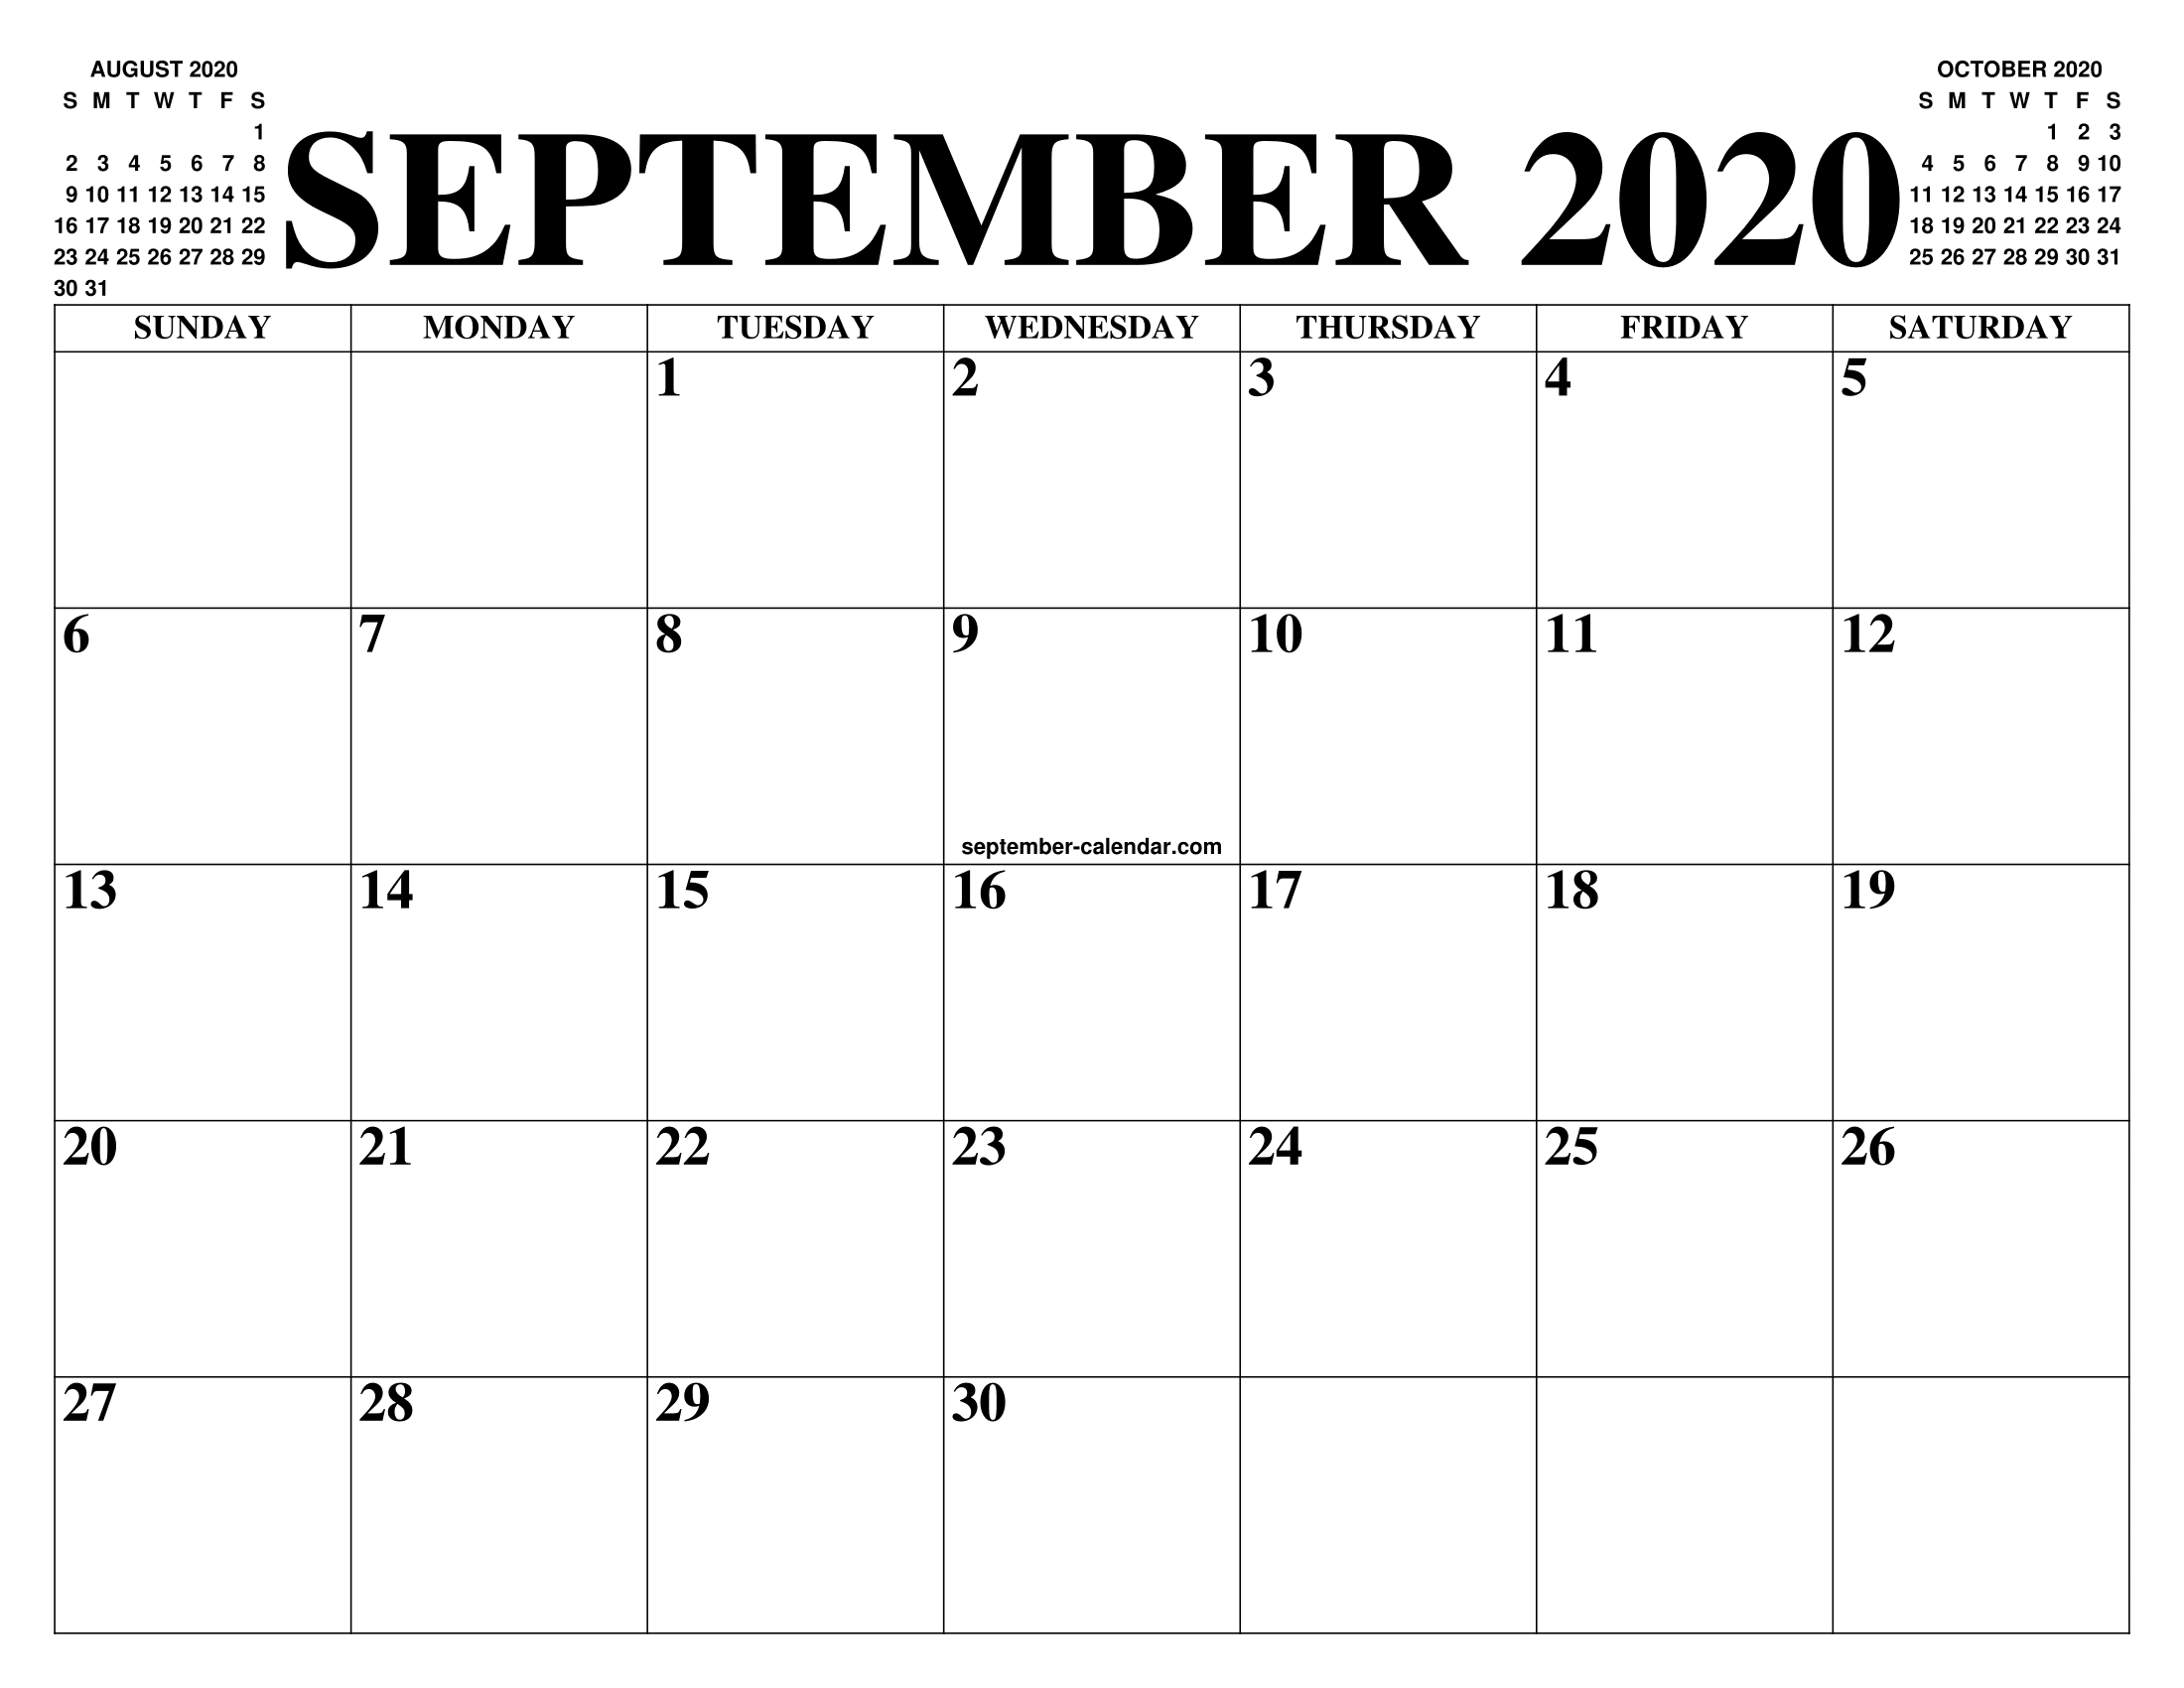 Calendario 2020 2020.September 2020 Calendar Of The Month Free Printable